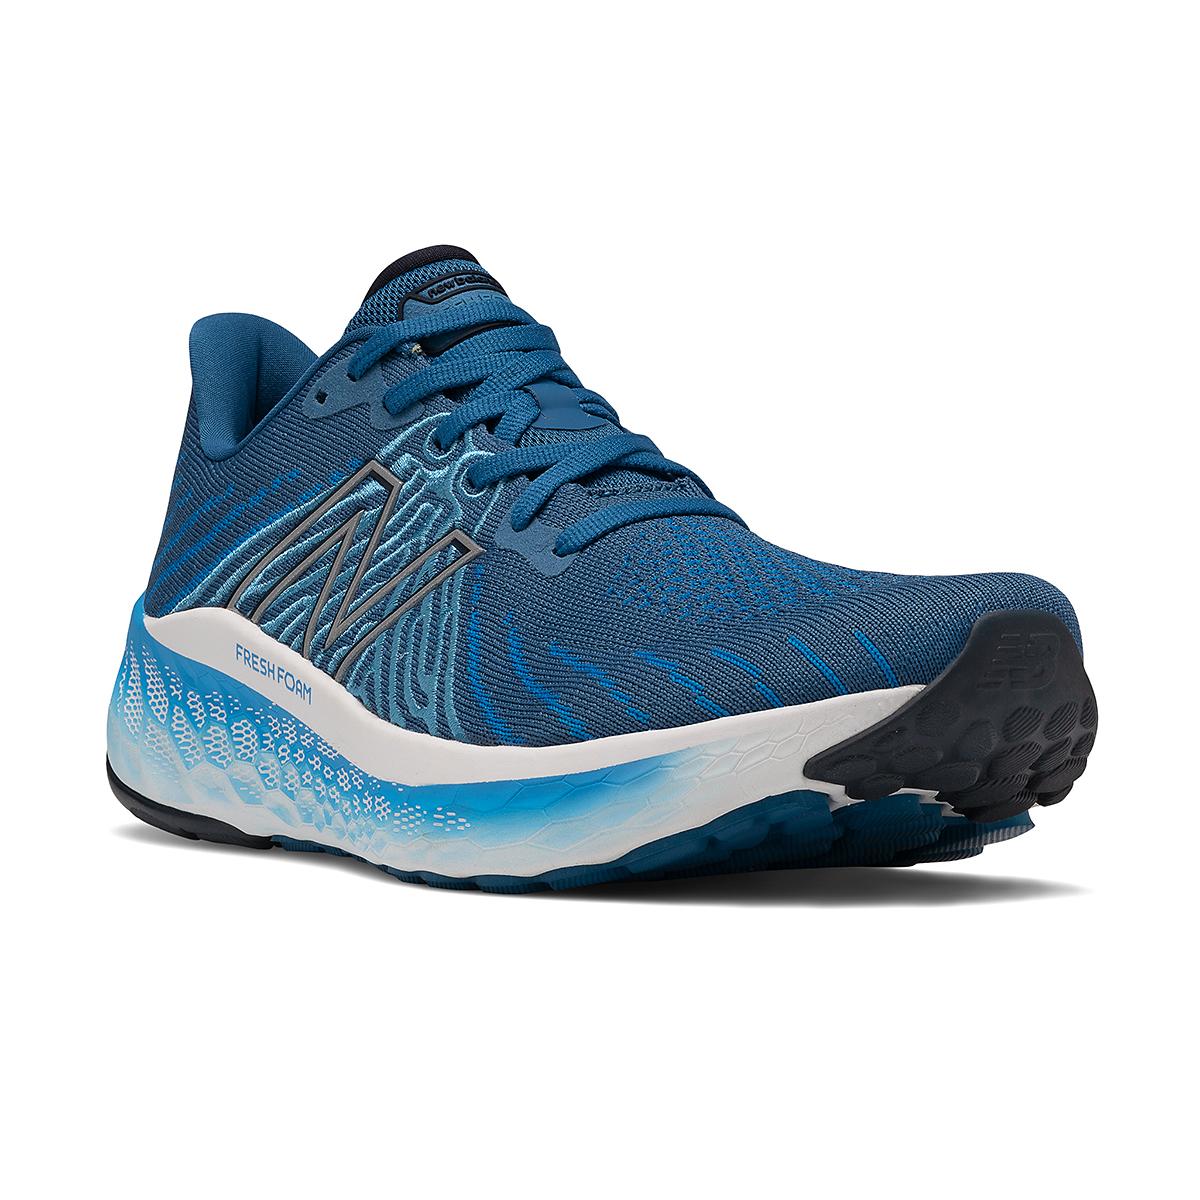 Men's New Balance Fresh Foam X Vongo V5 Running Shoe - Color: Oxygen Blue/Laser Blue - Size: 7 - Width: Wide, Oxygen Blue/Laser Blue, large, image 5